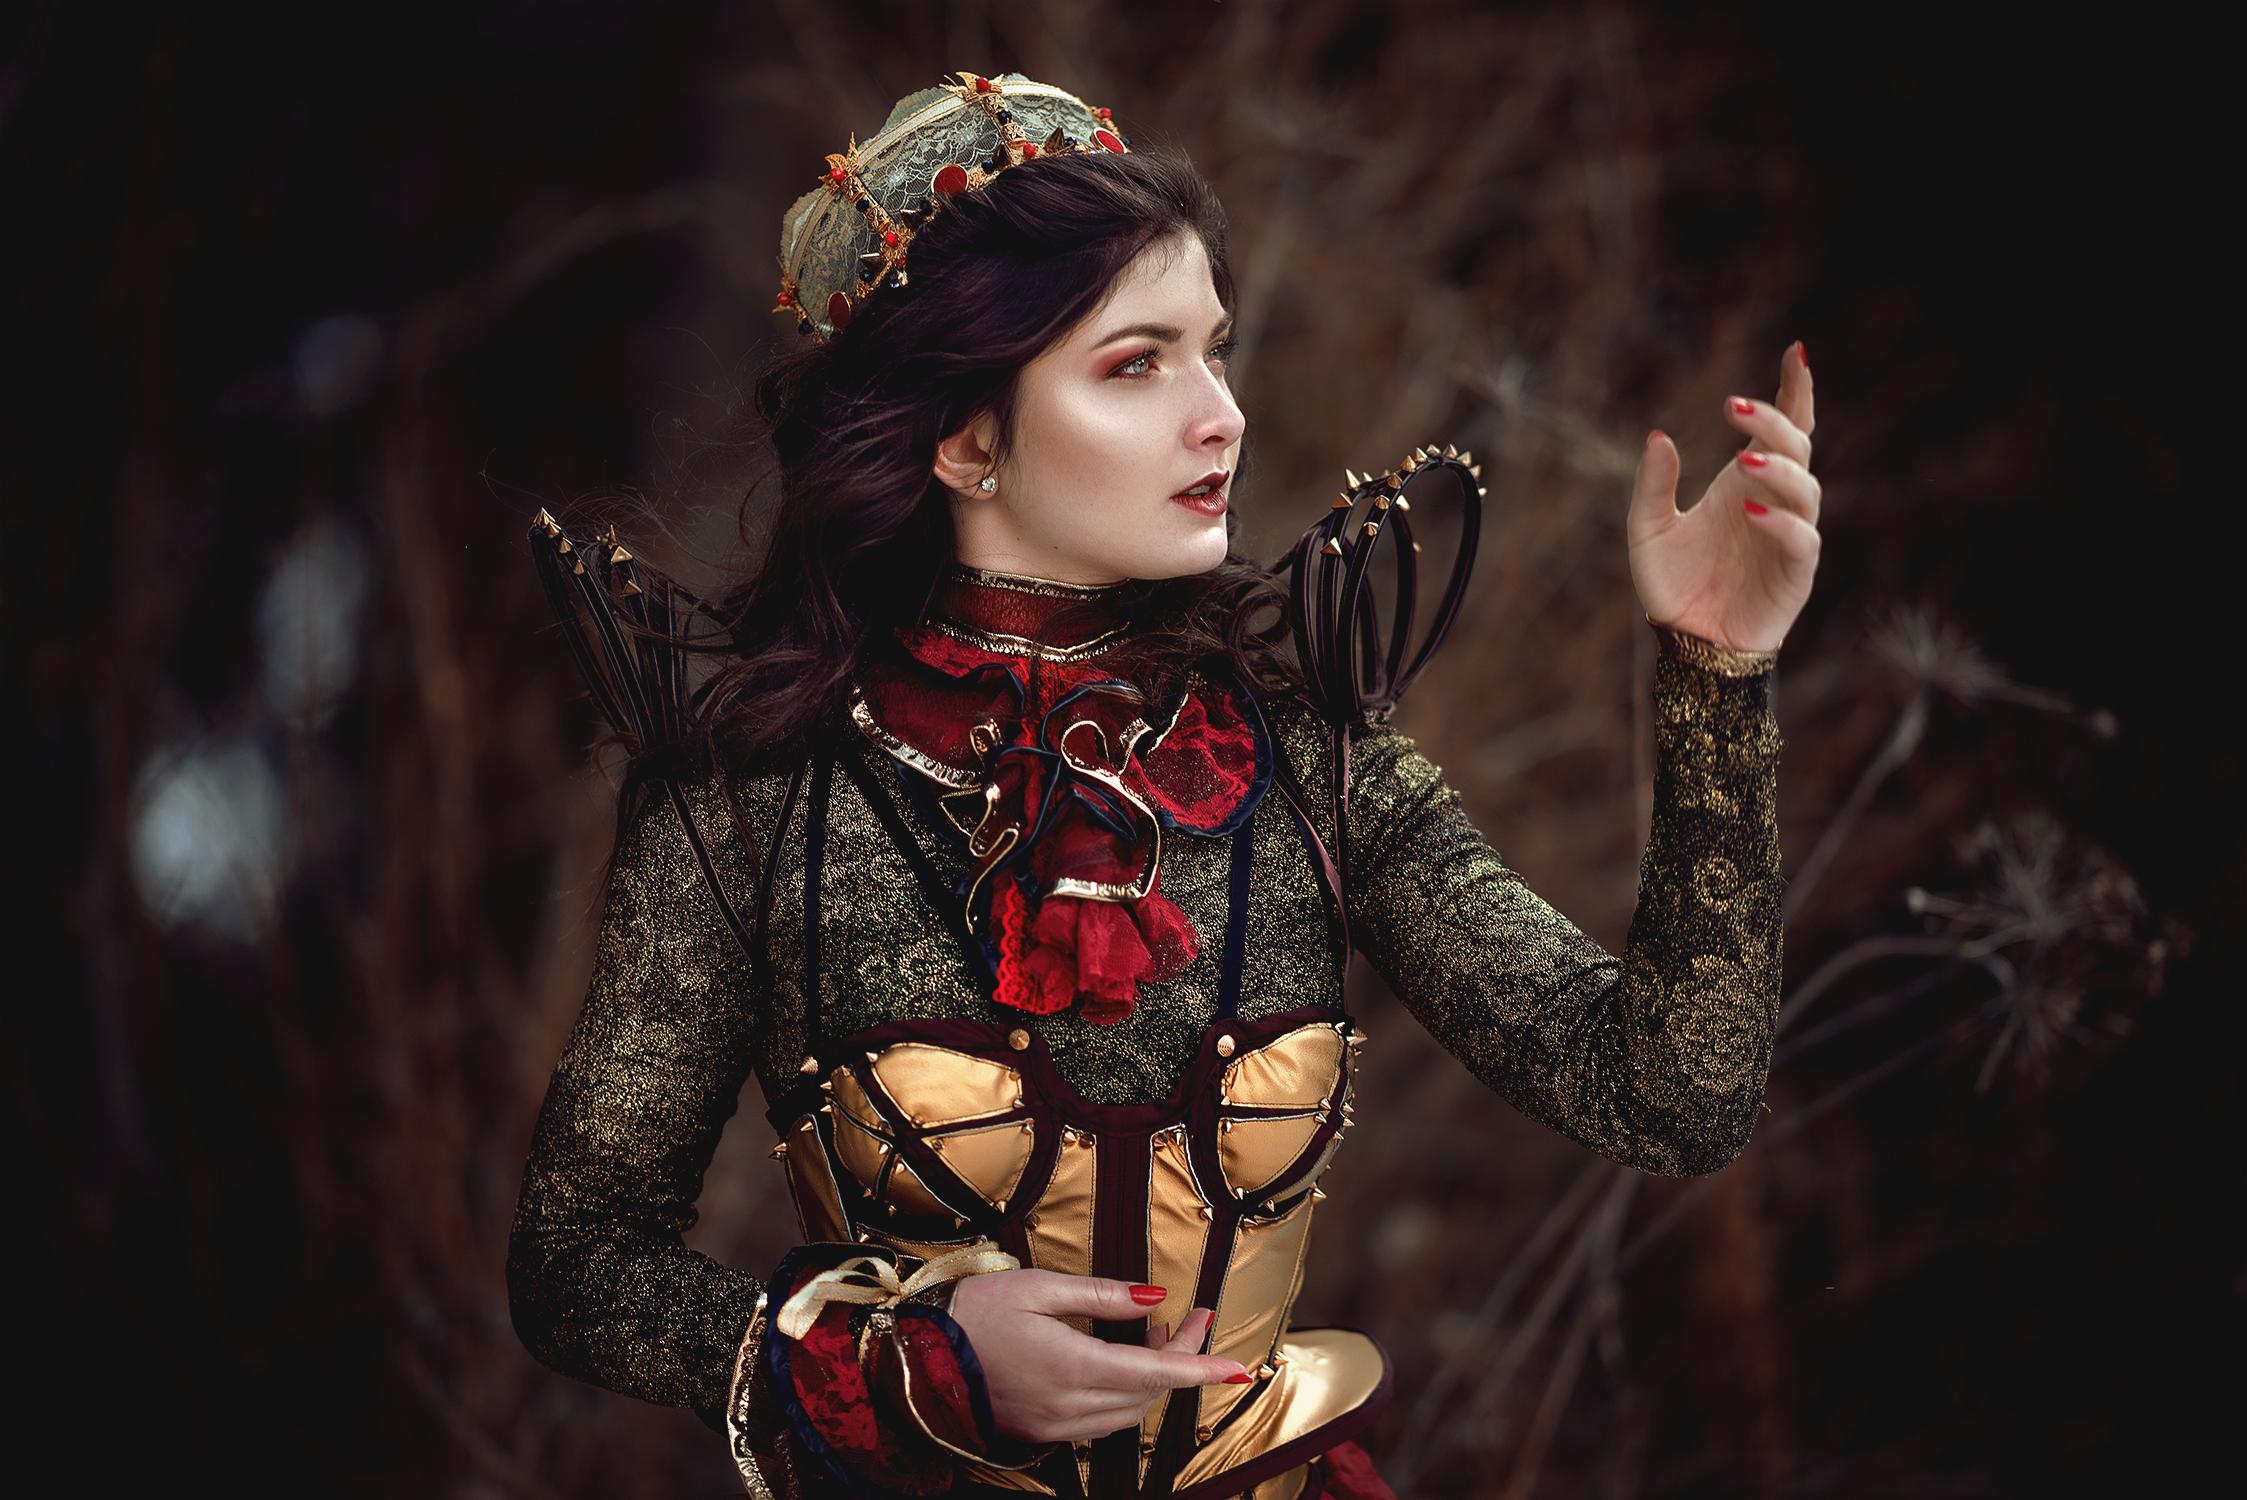 Général Guérisse Dress Fantasy Fashion